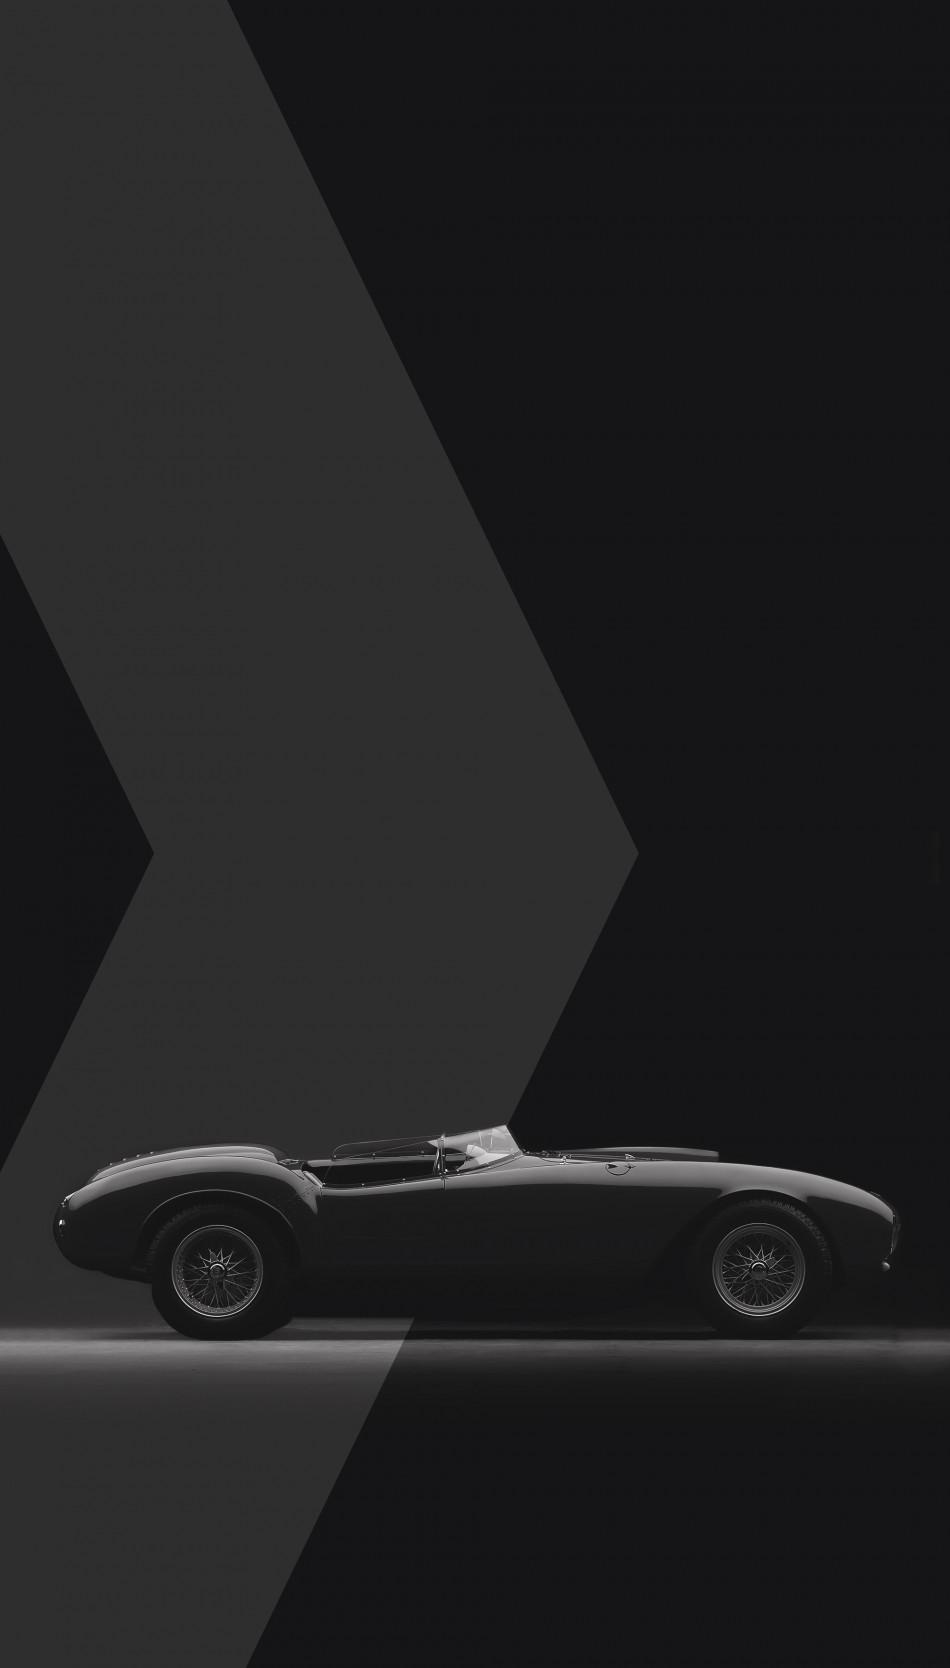 Cryns-Car.jpg